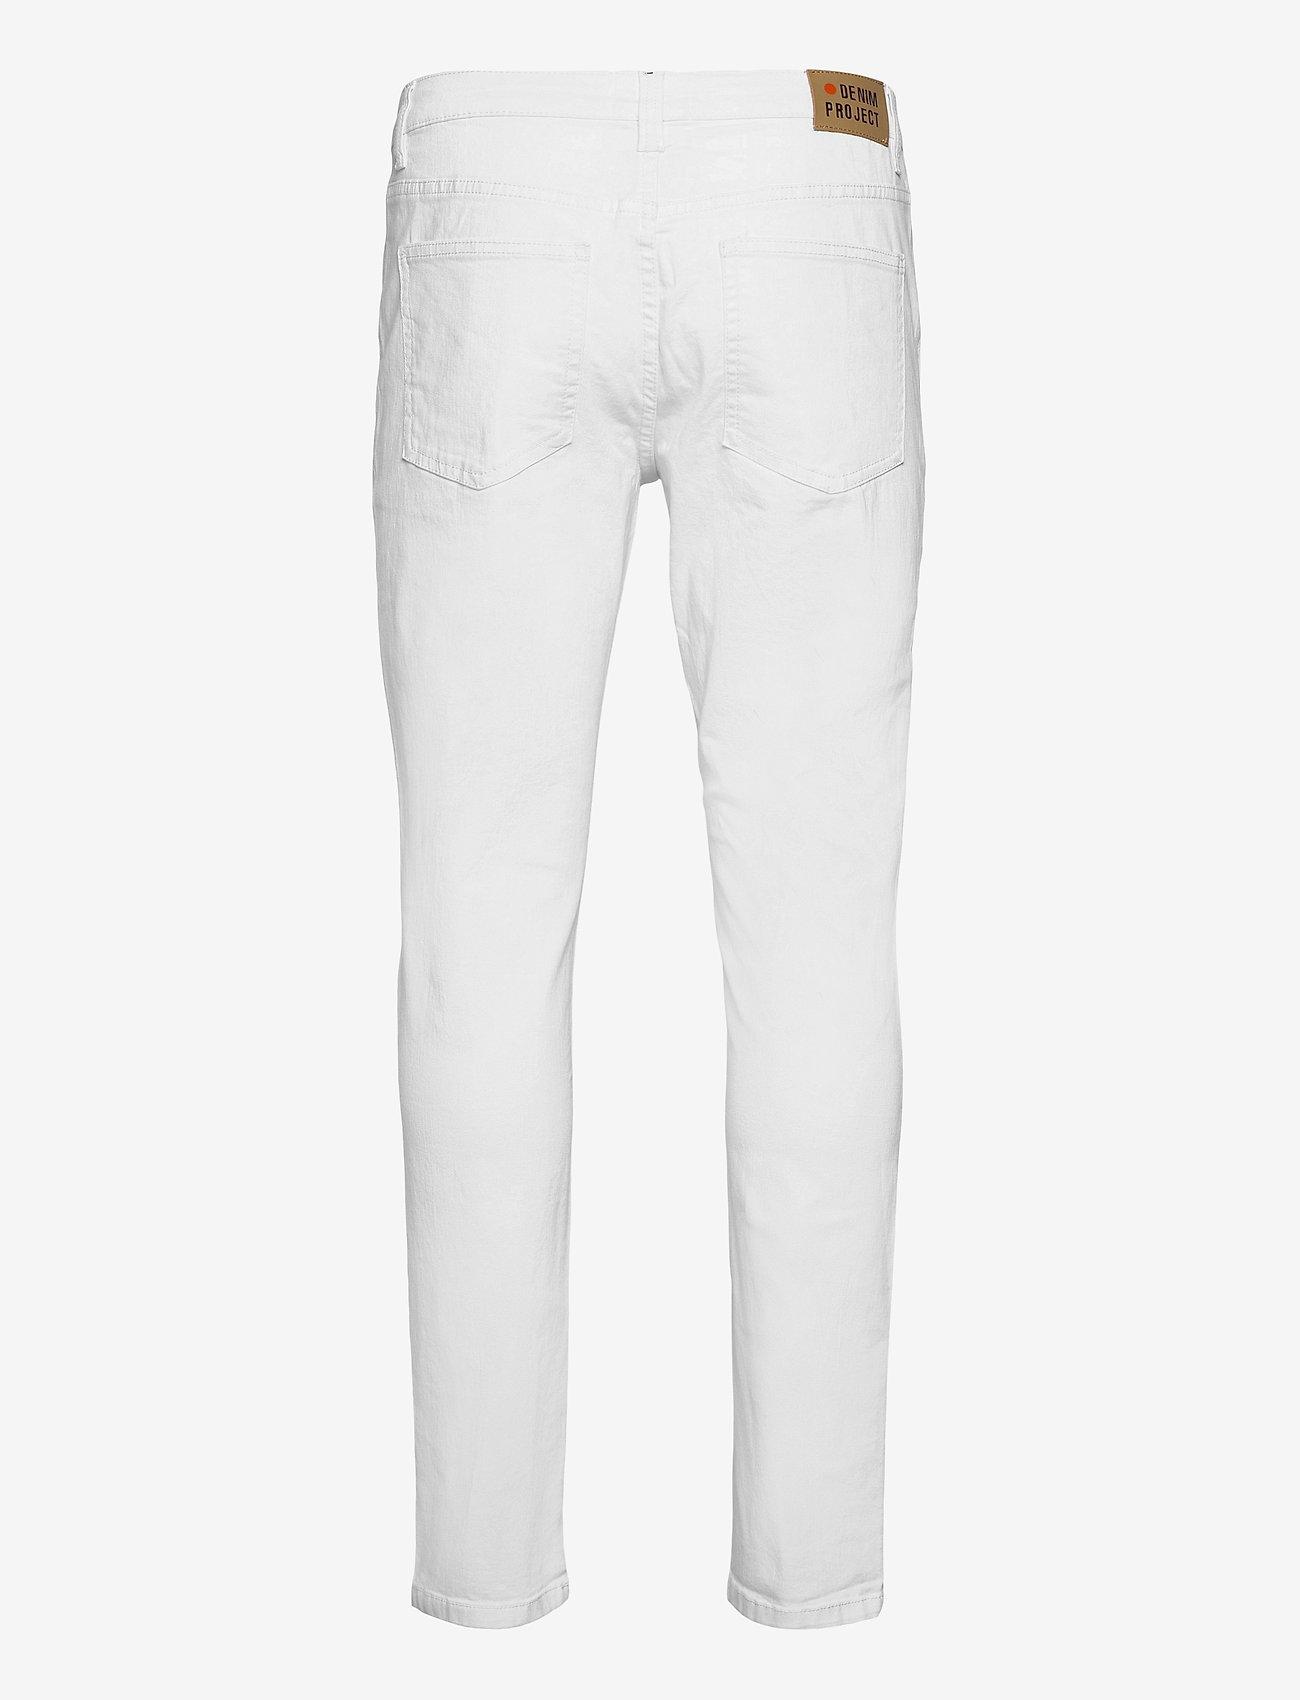 Denim project - Mr. Red - slim jeans - white - 1